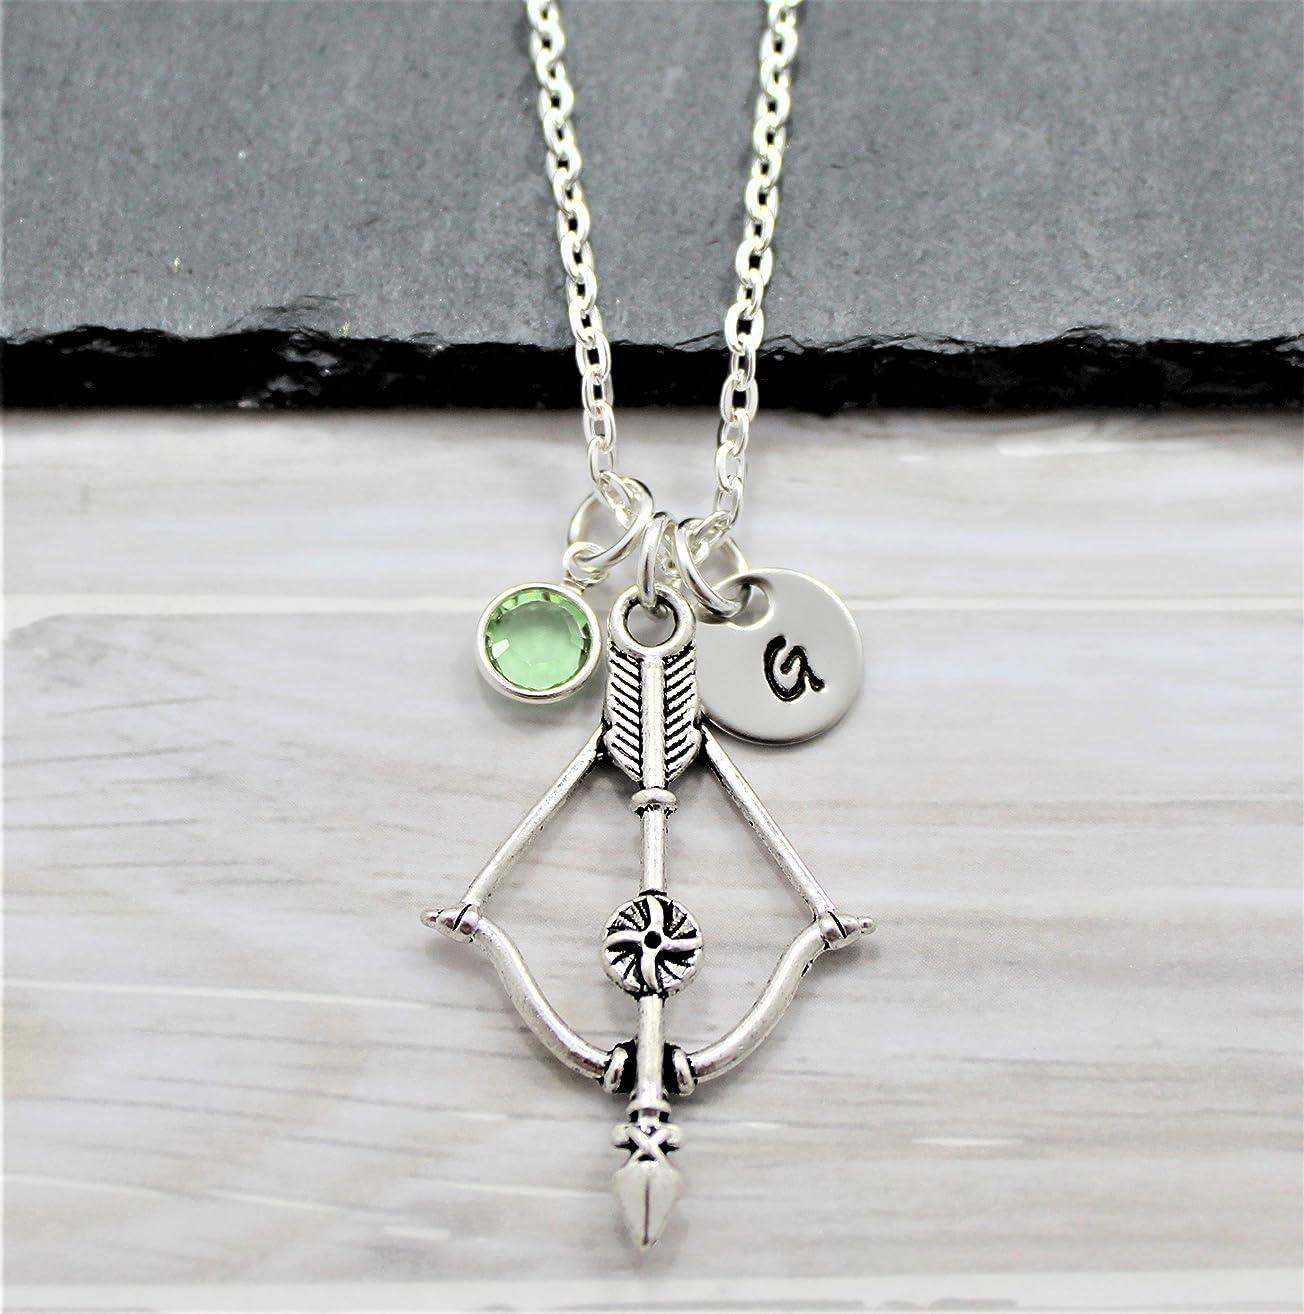 Bow and Arrow Archery Necklace - Personalized Birthstone & Initial - Archery Jewelry - Fast Shipping